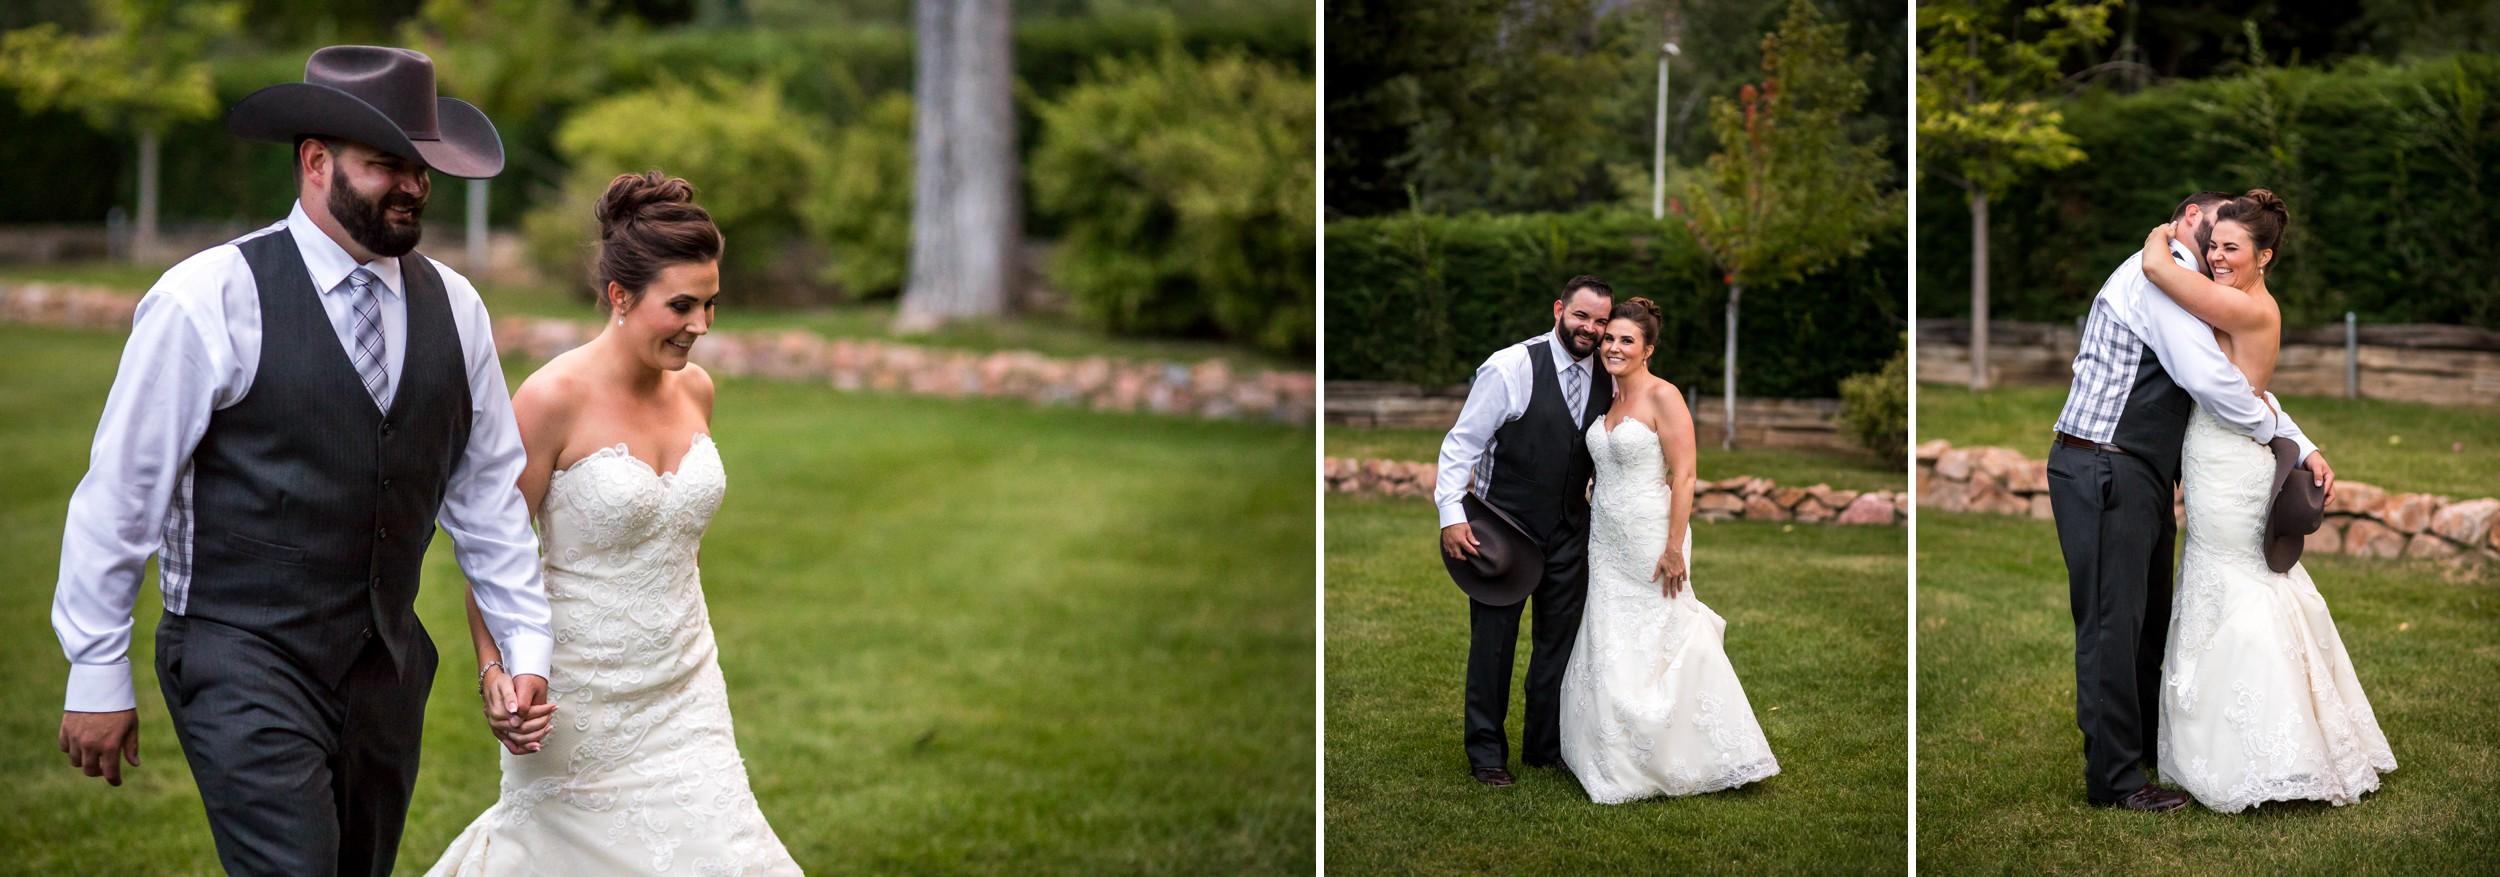 Criddle Wedding 20.jpg